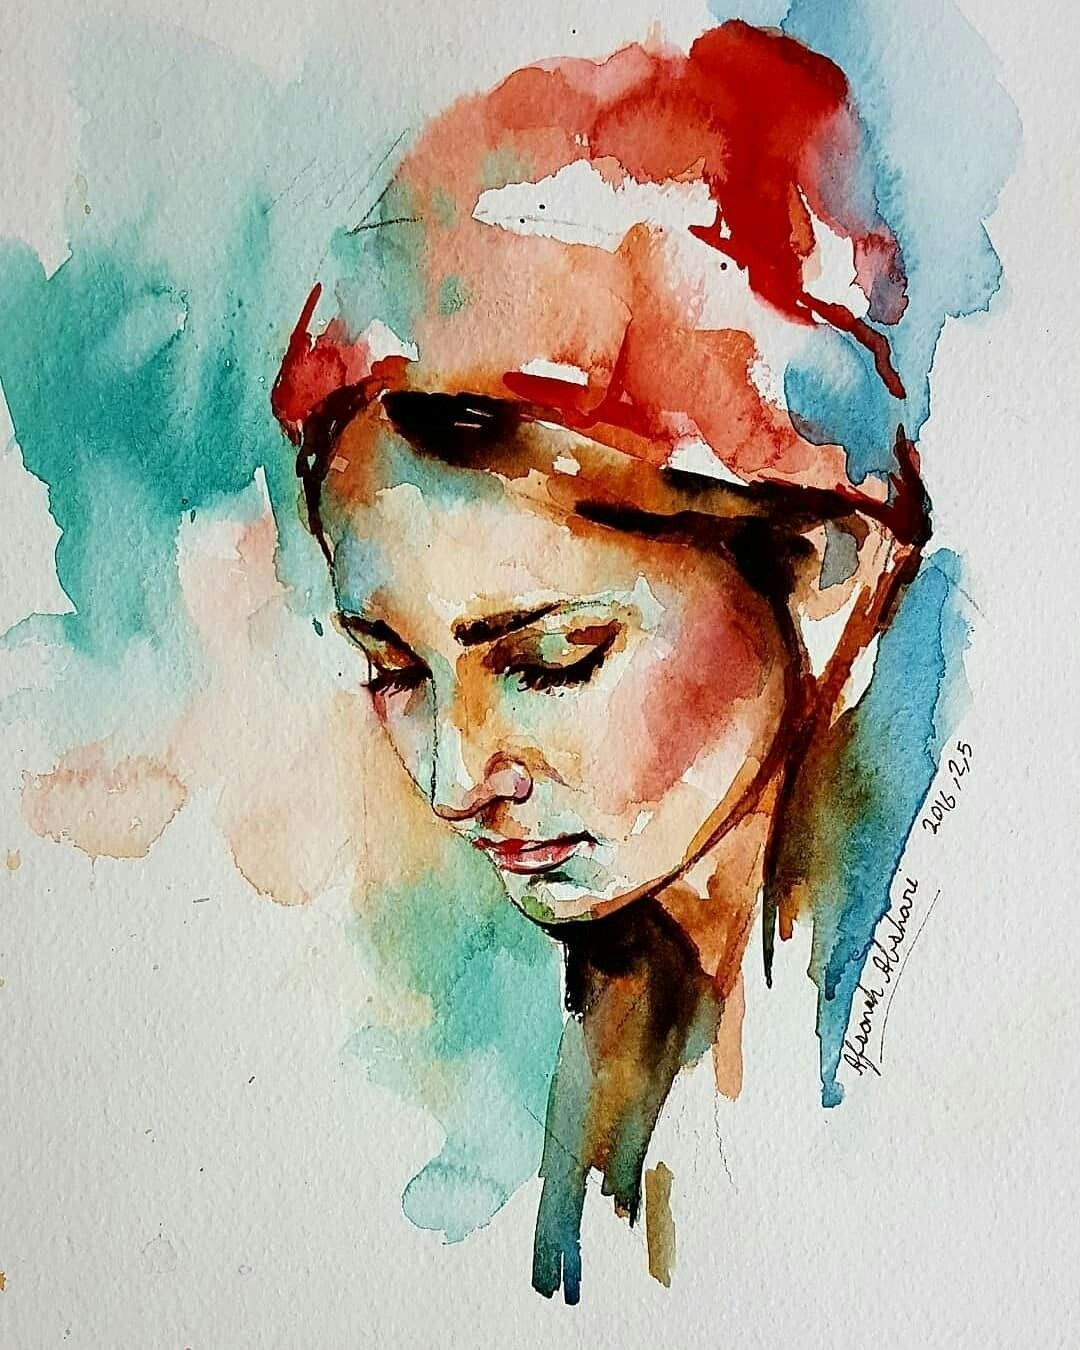 Suluboya Portre Watercolor Portraits Watercolor Portrait Painting Portrait Painting Watercolor Portraits